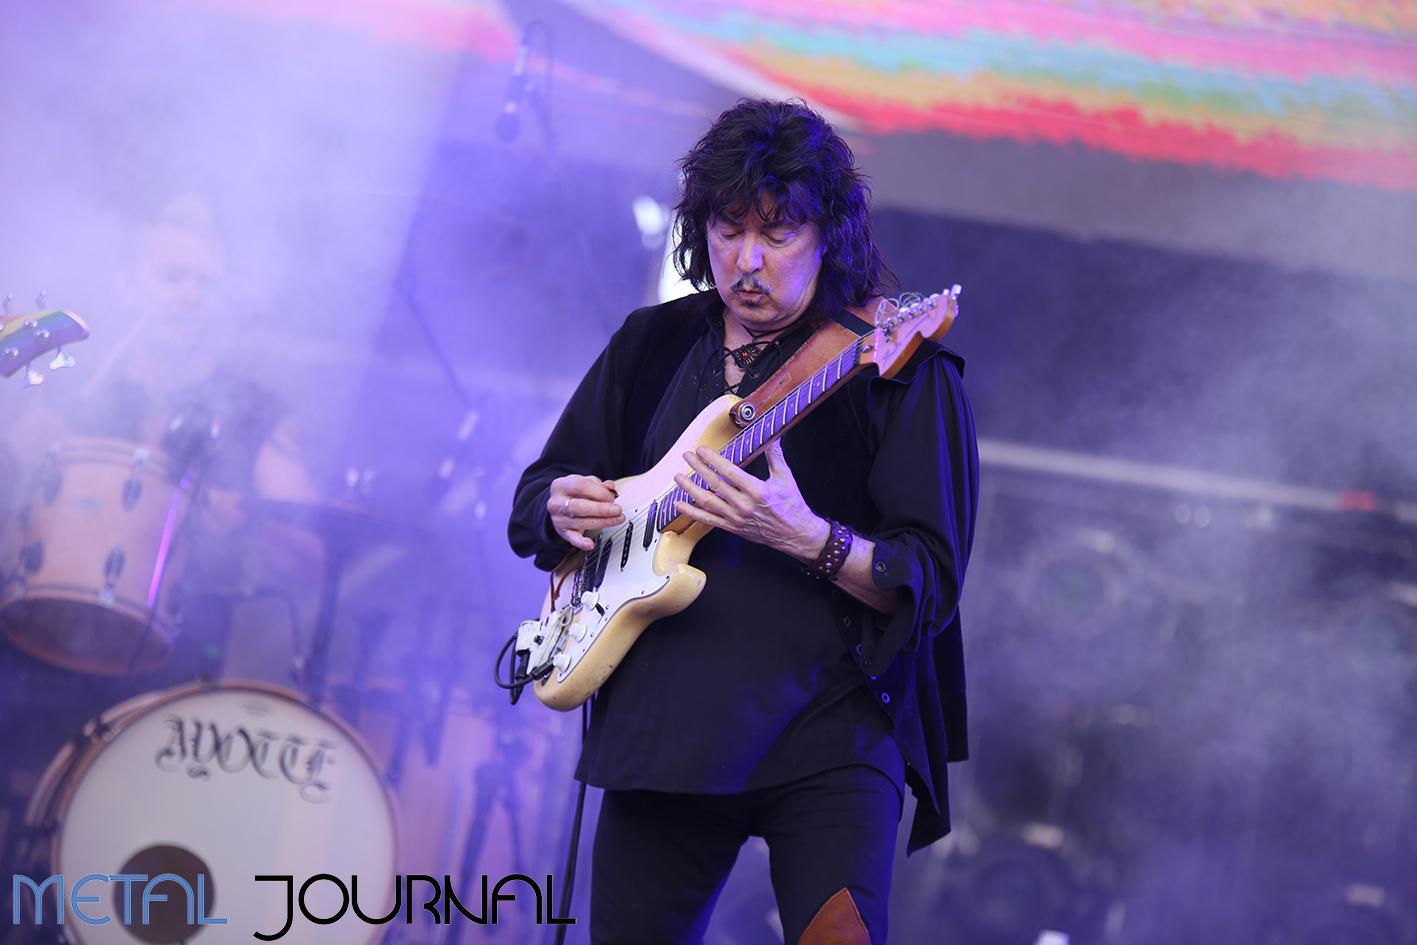 rainbow metal journal rock the coast 2019 pic 10